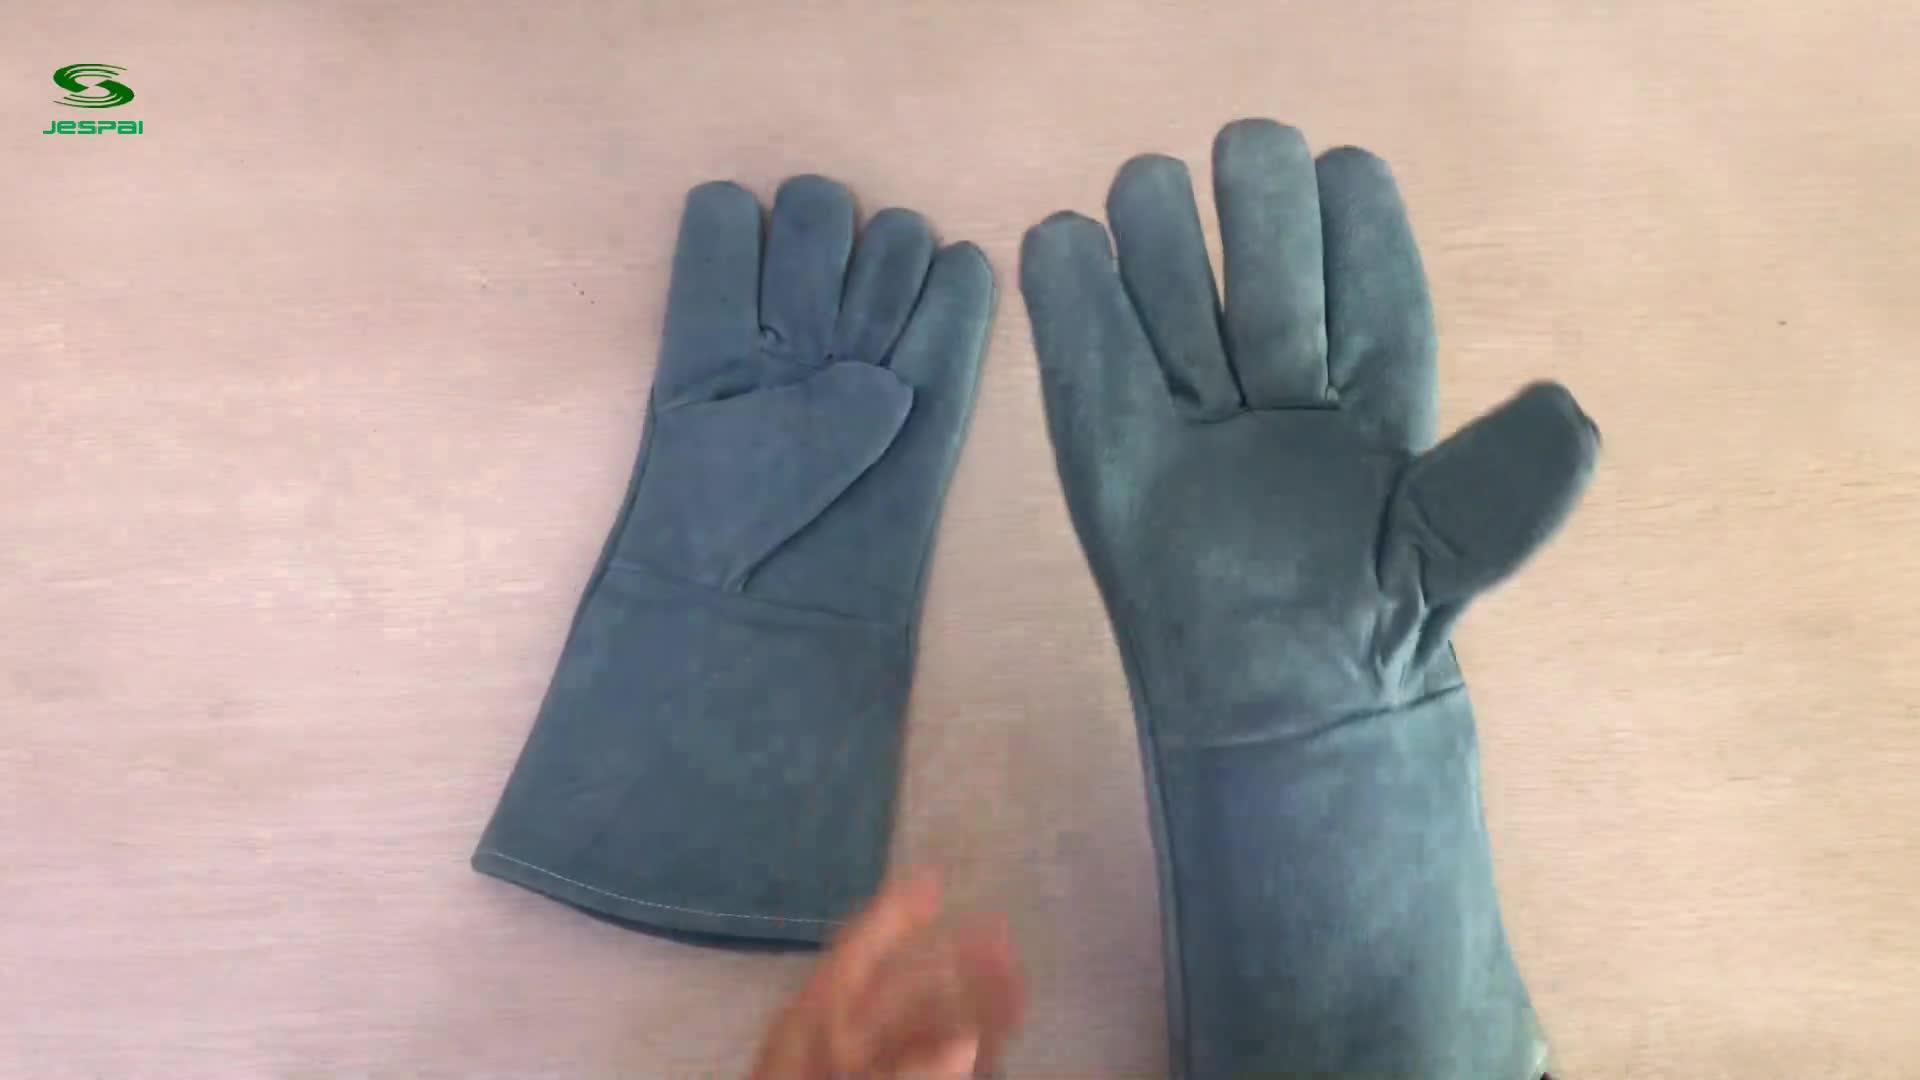 Factory Jespai 10.5inch Blue Cow split leather lightweight work gloves